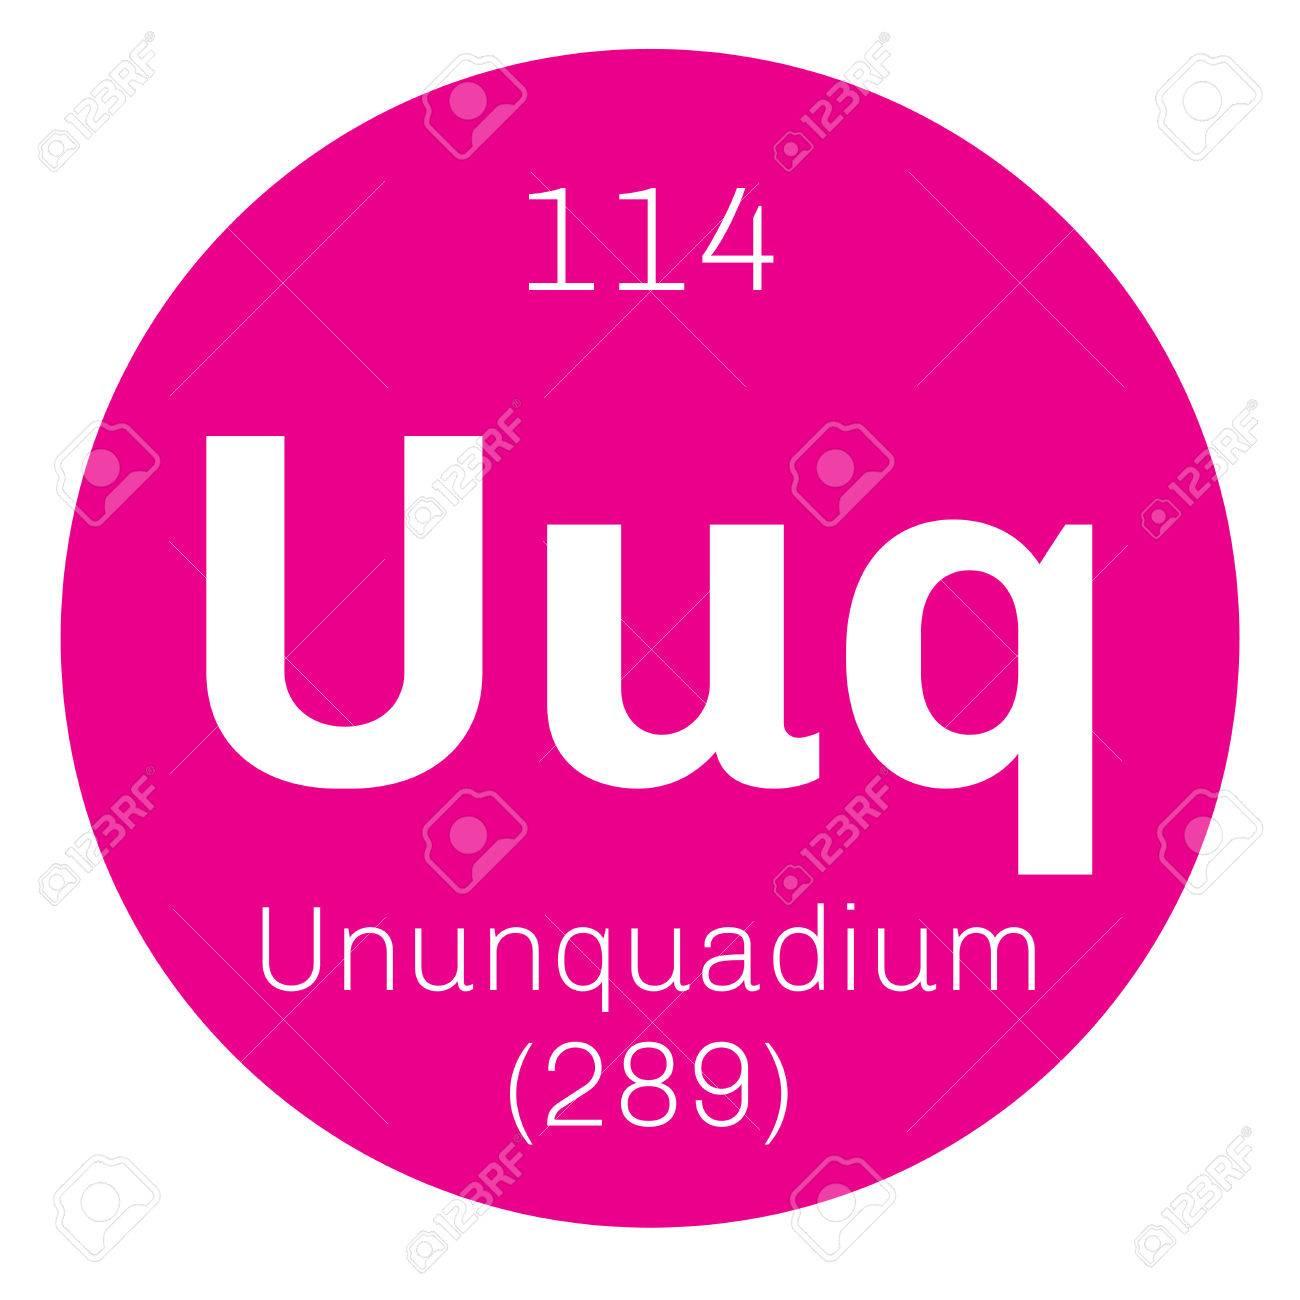 ununquadium chemical element science symbol chemistry colored icon with atomic number and atomic weight - Periodic Table Symbol Ununquadium